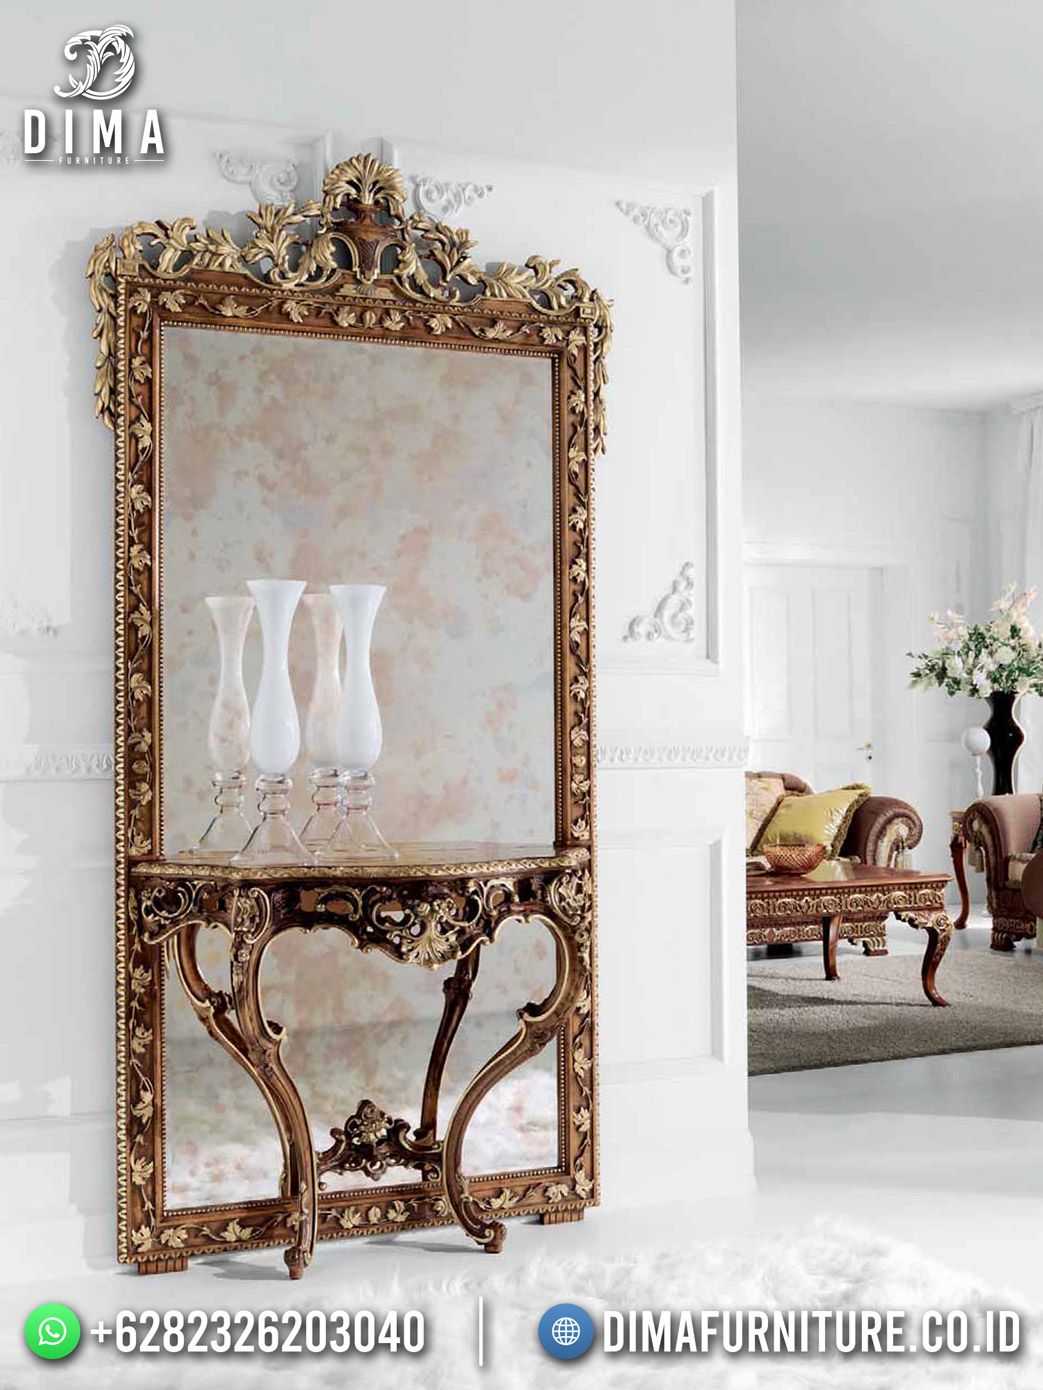 Royal Design Meja Konsol Jepara Gorgeous DF-1662